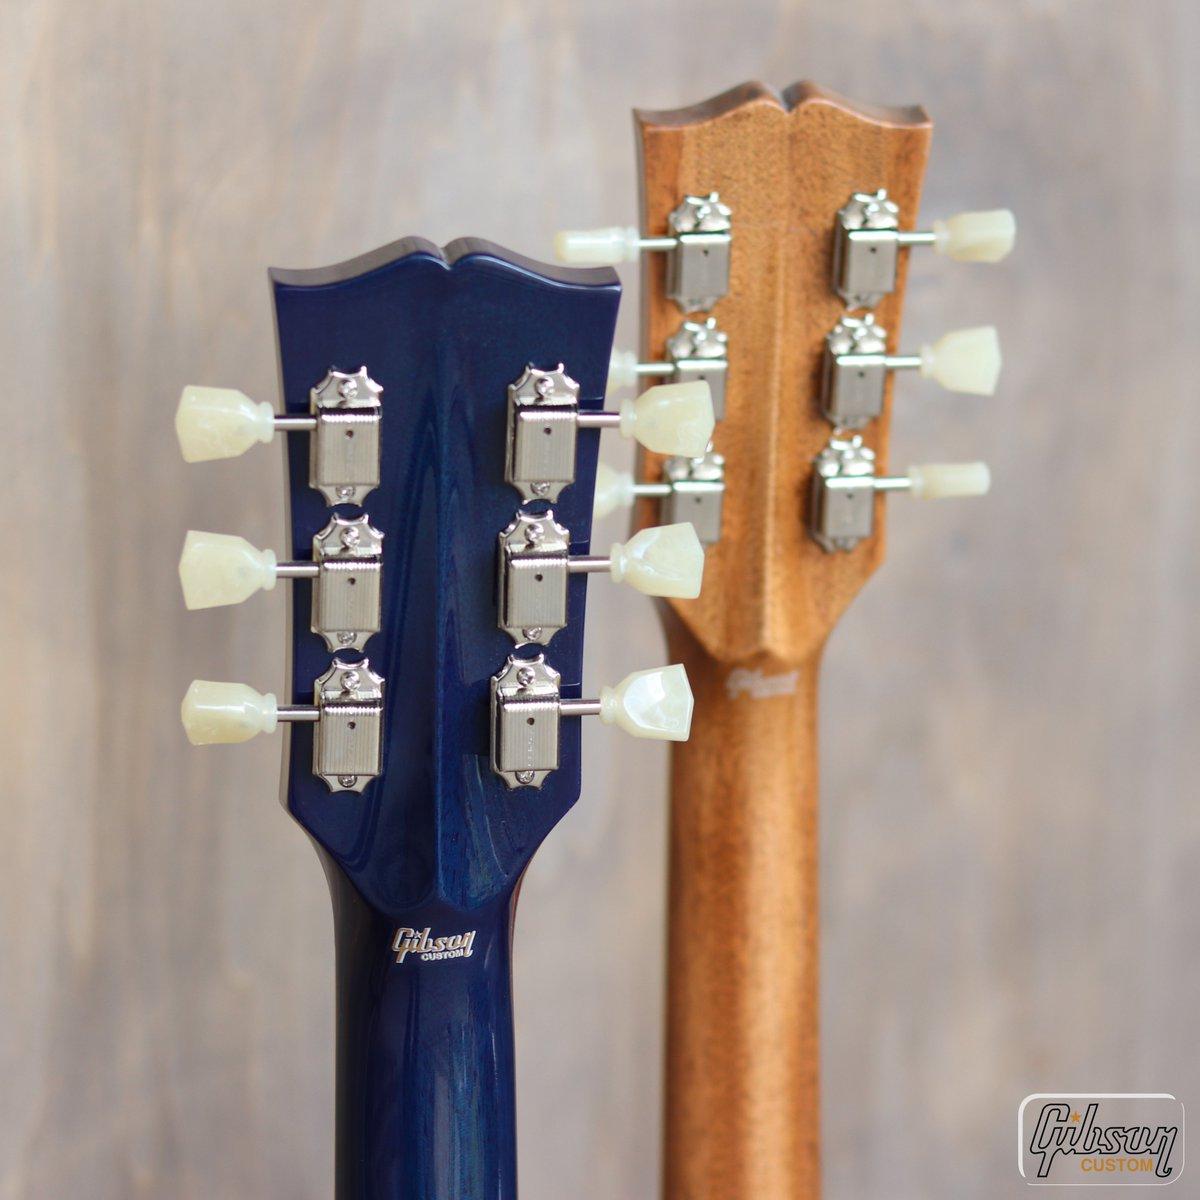 Gibson Custom Shop on Twitter: